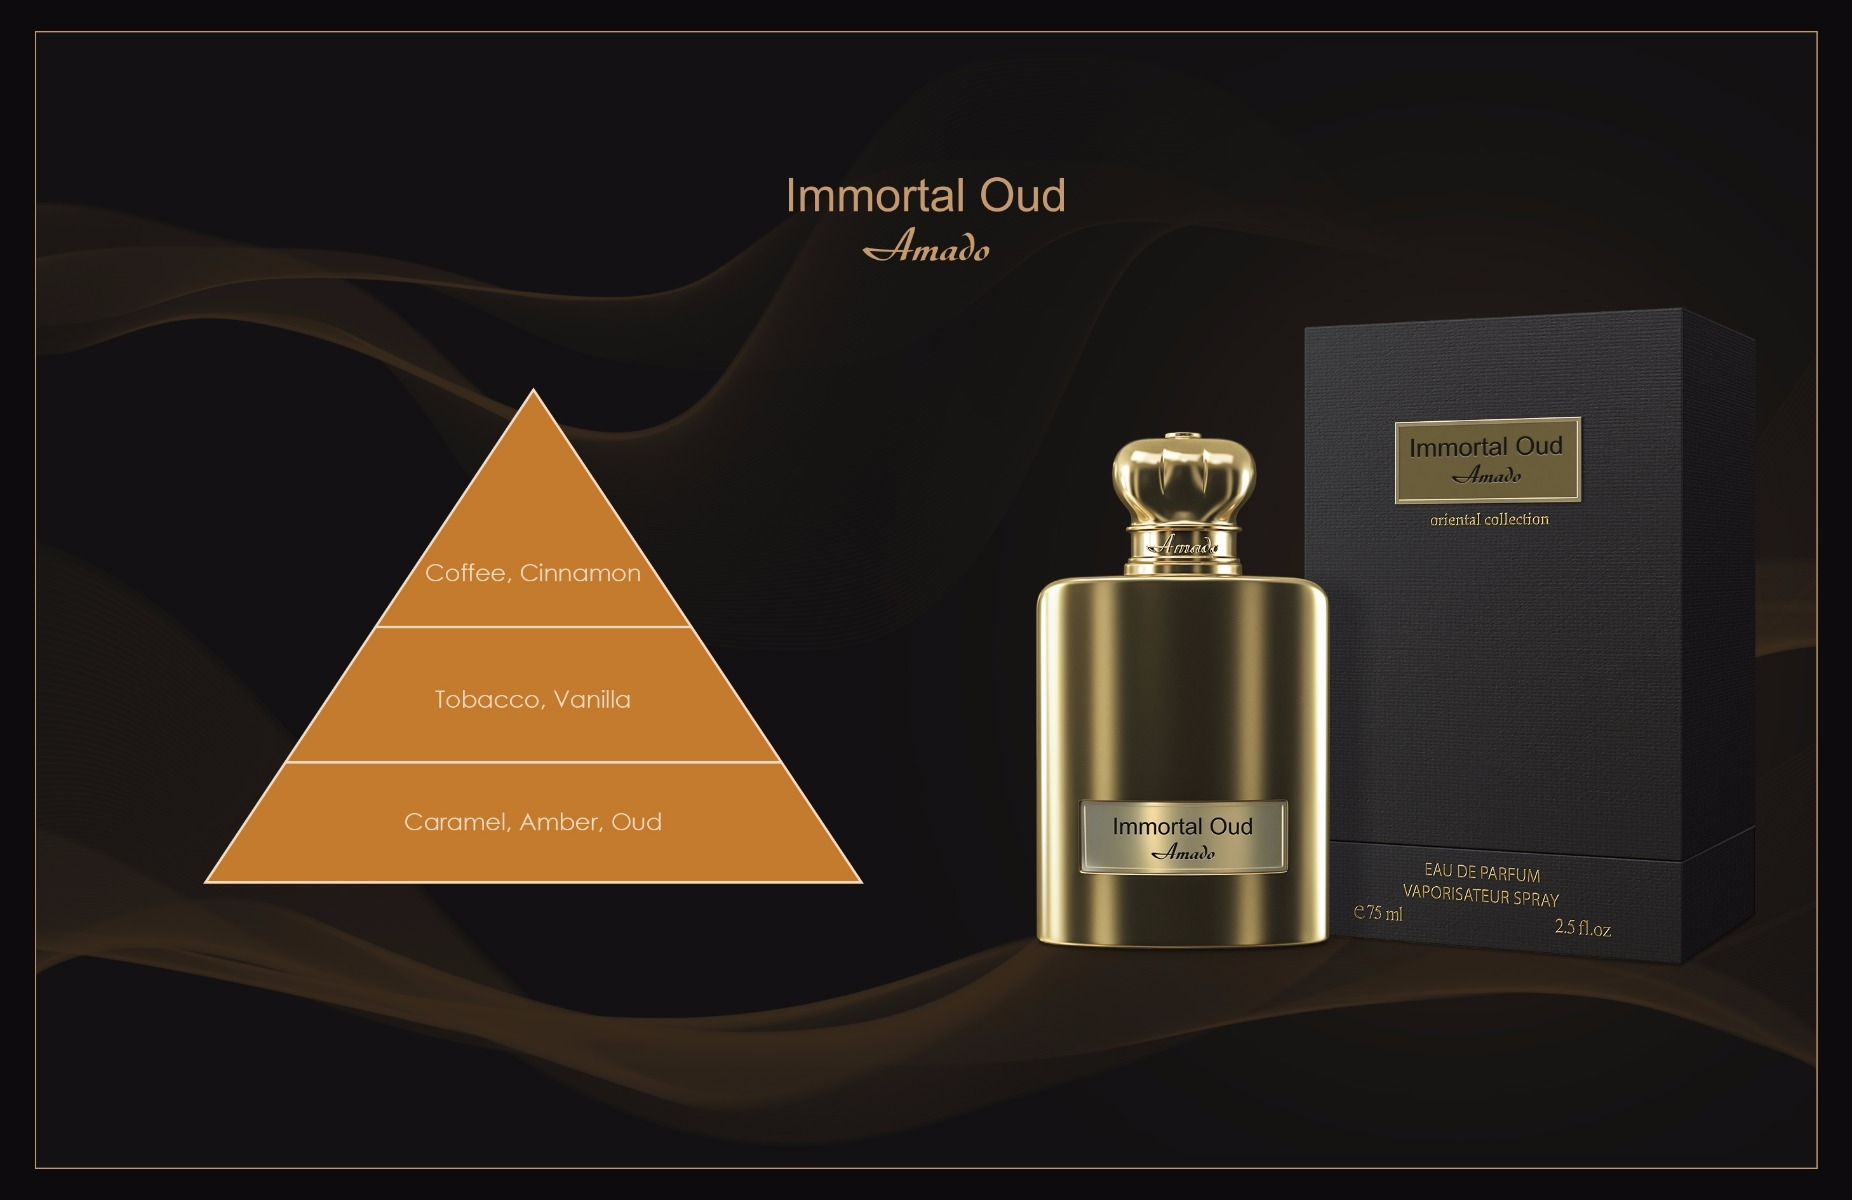 Immortal Oud